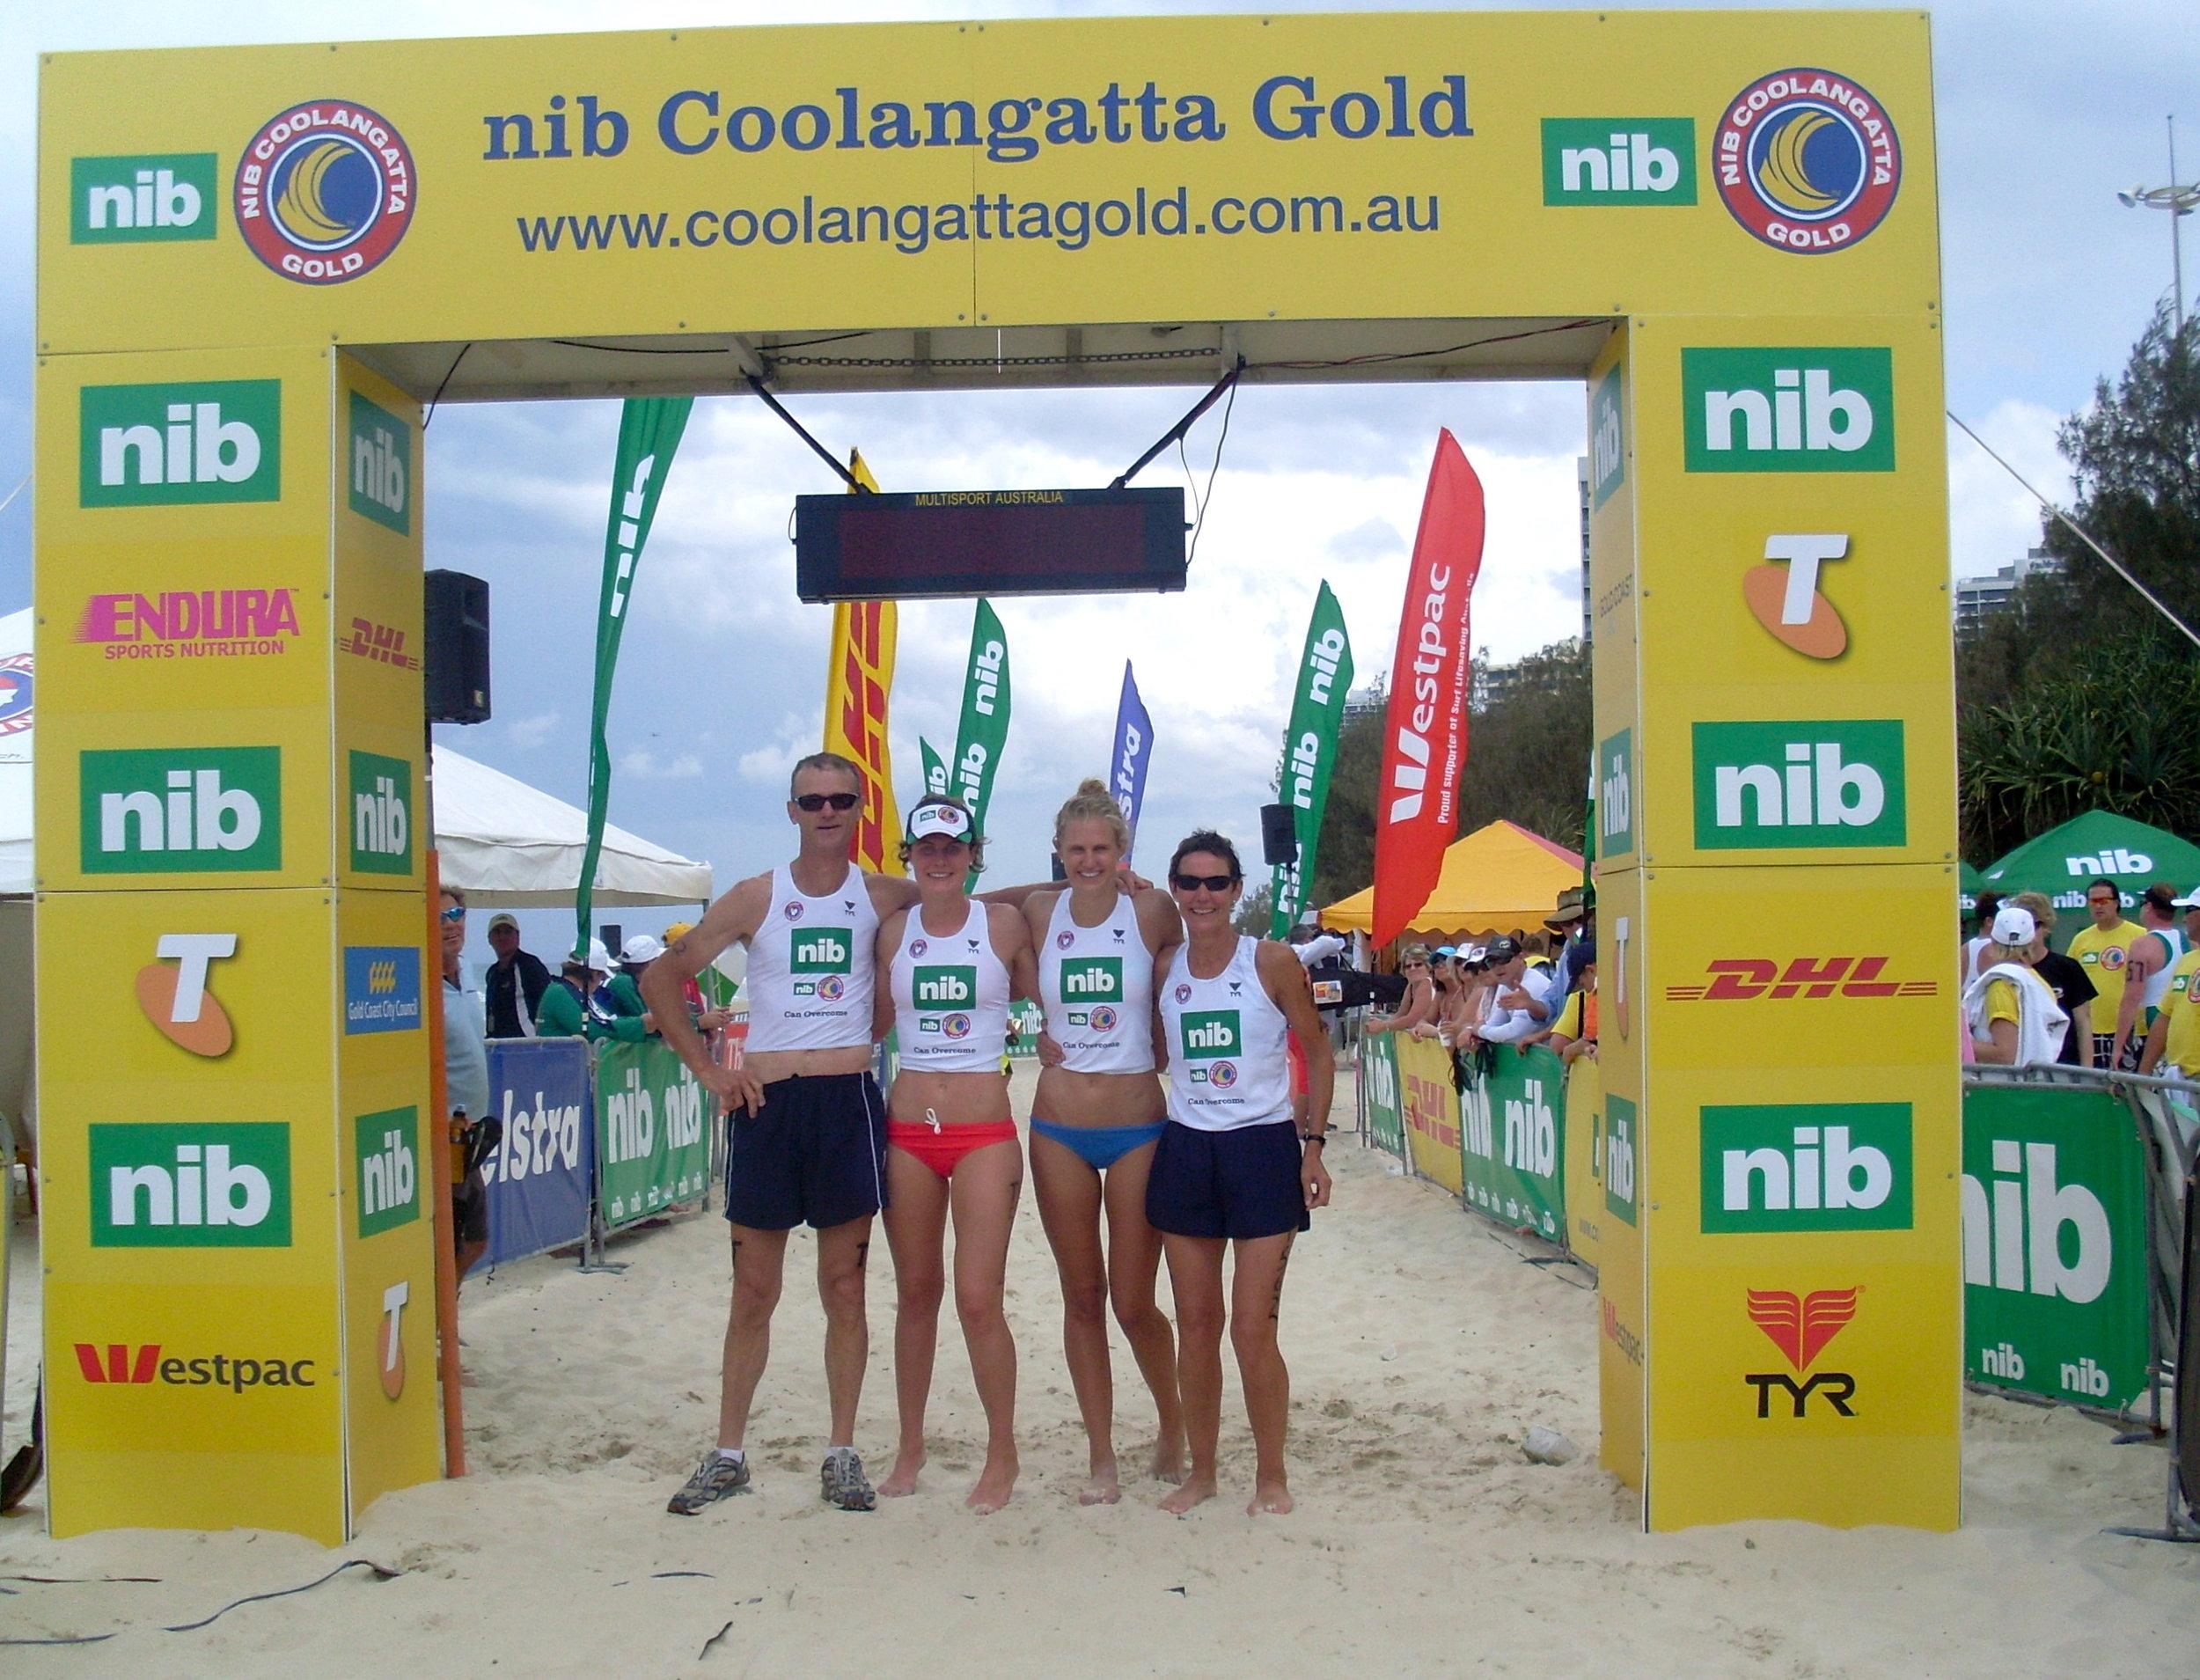 Family Coolangatta Gold team - 2009